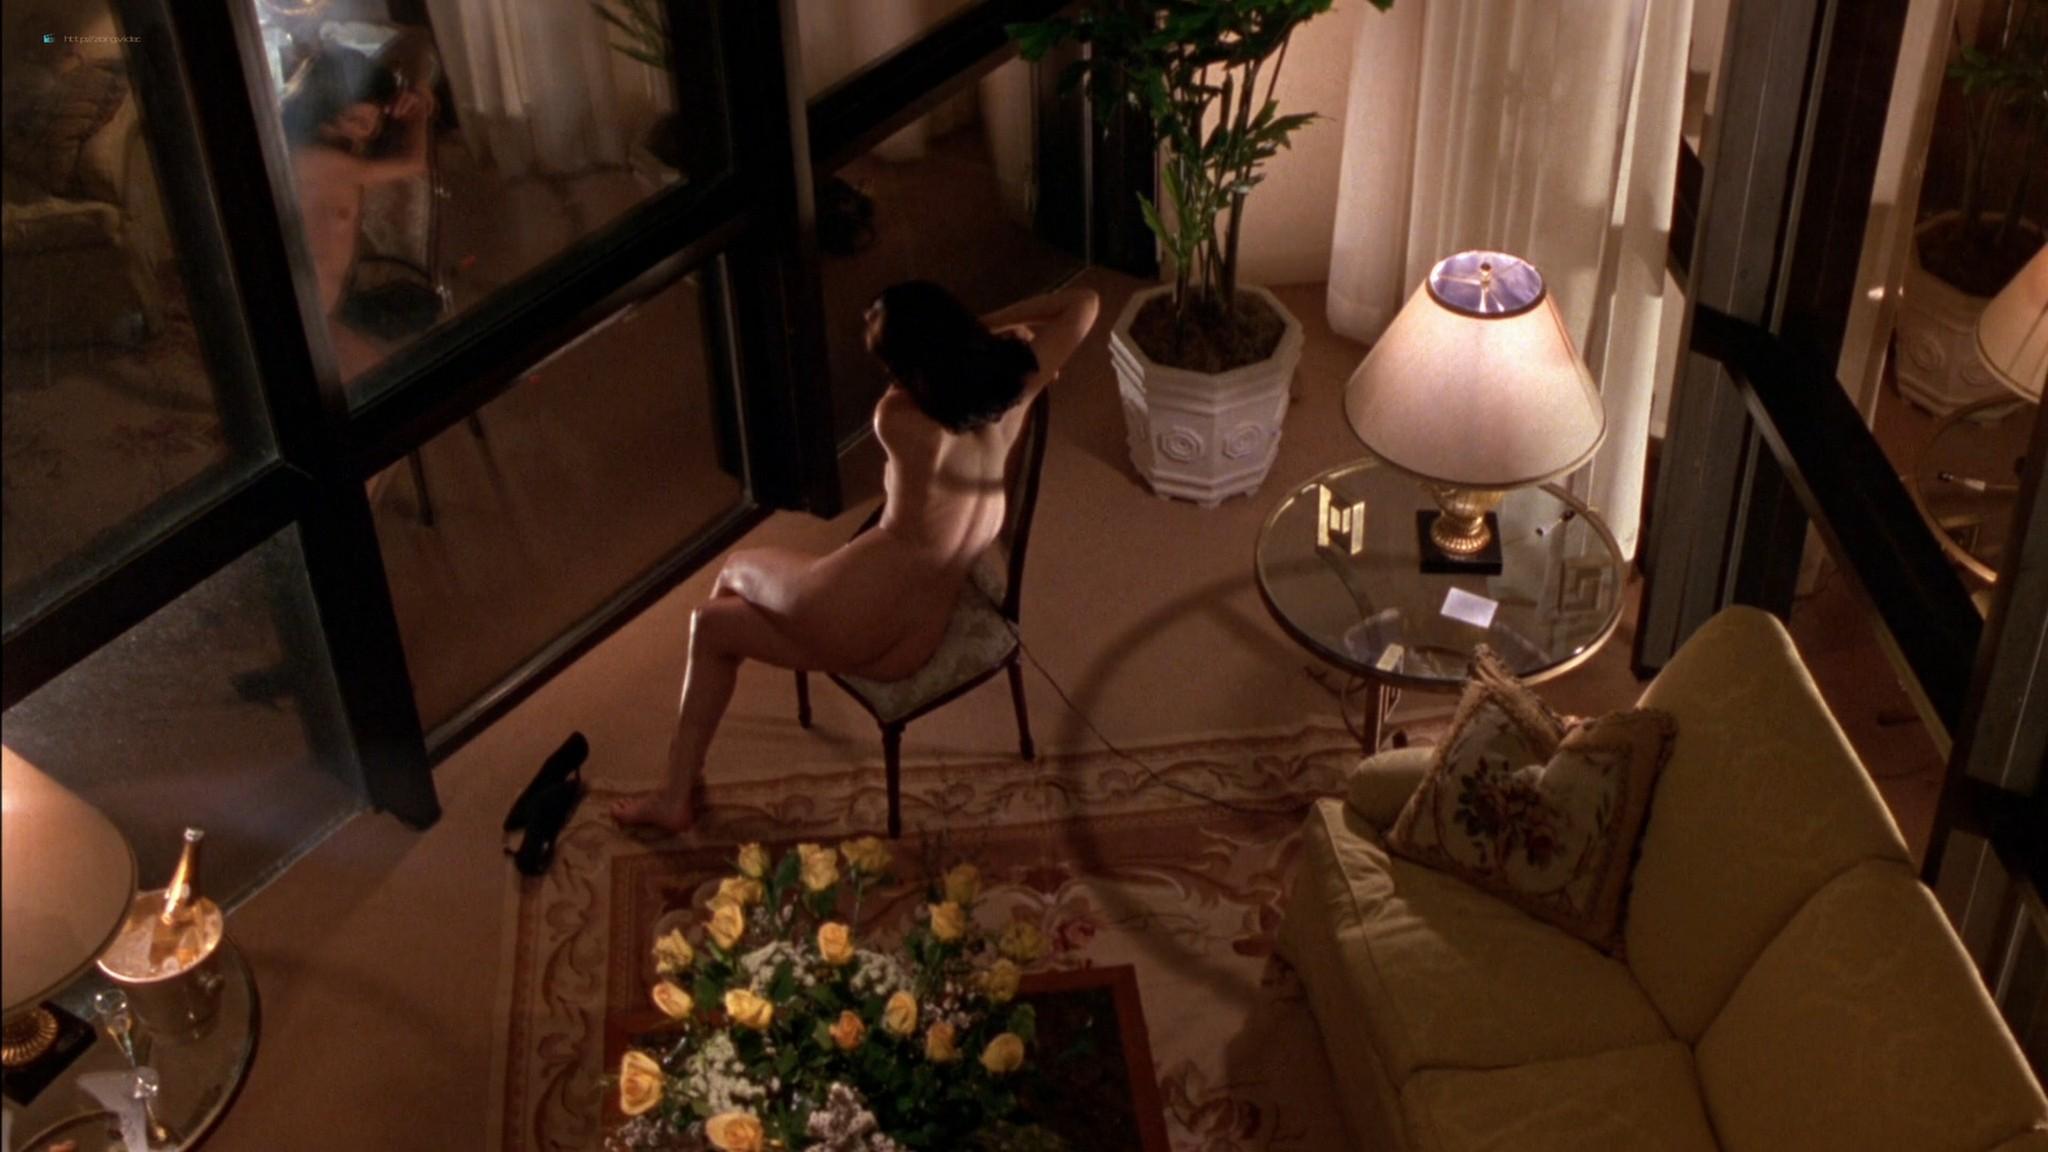 Linda Fiorentino nude Angie Everhart nude full frontal - Jade (1995) HD 1080p BluRay (18)